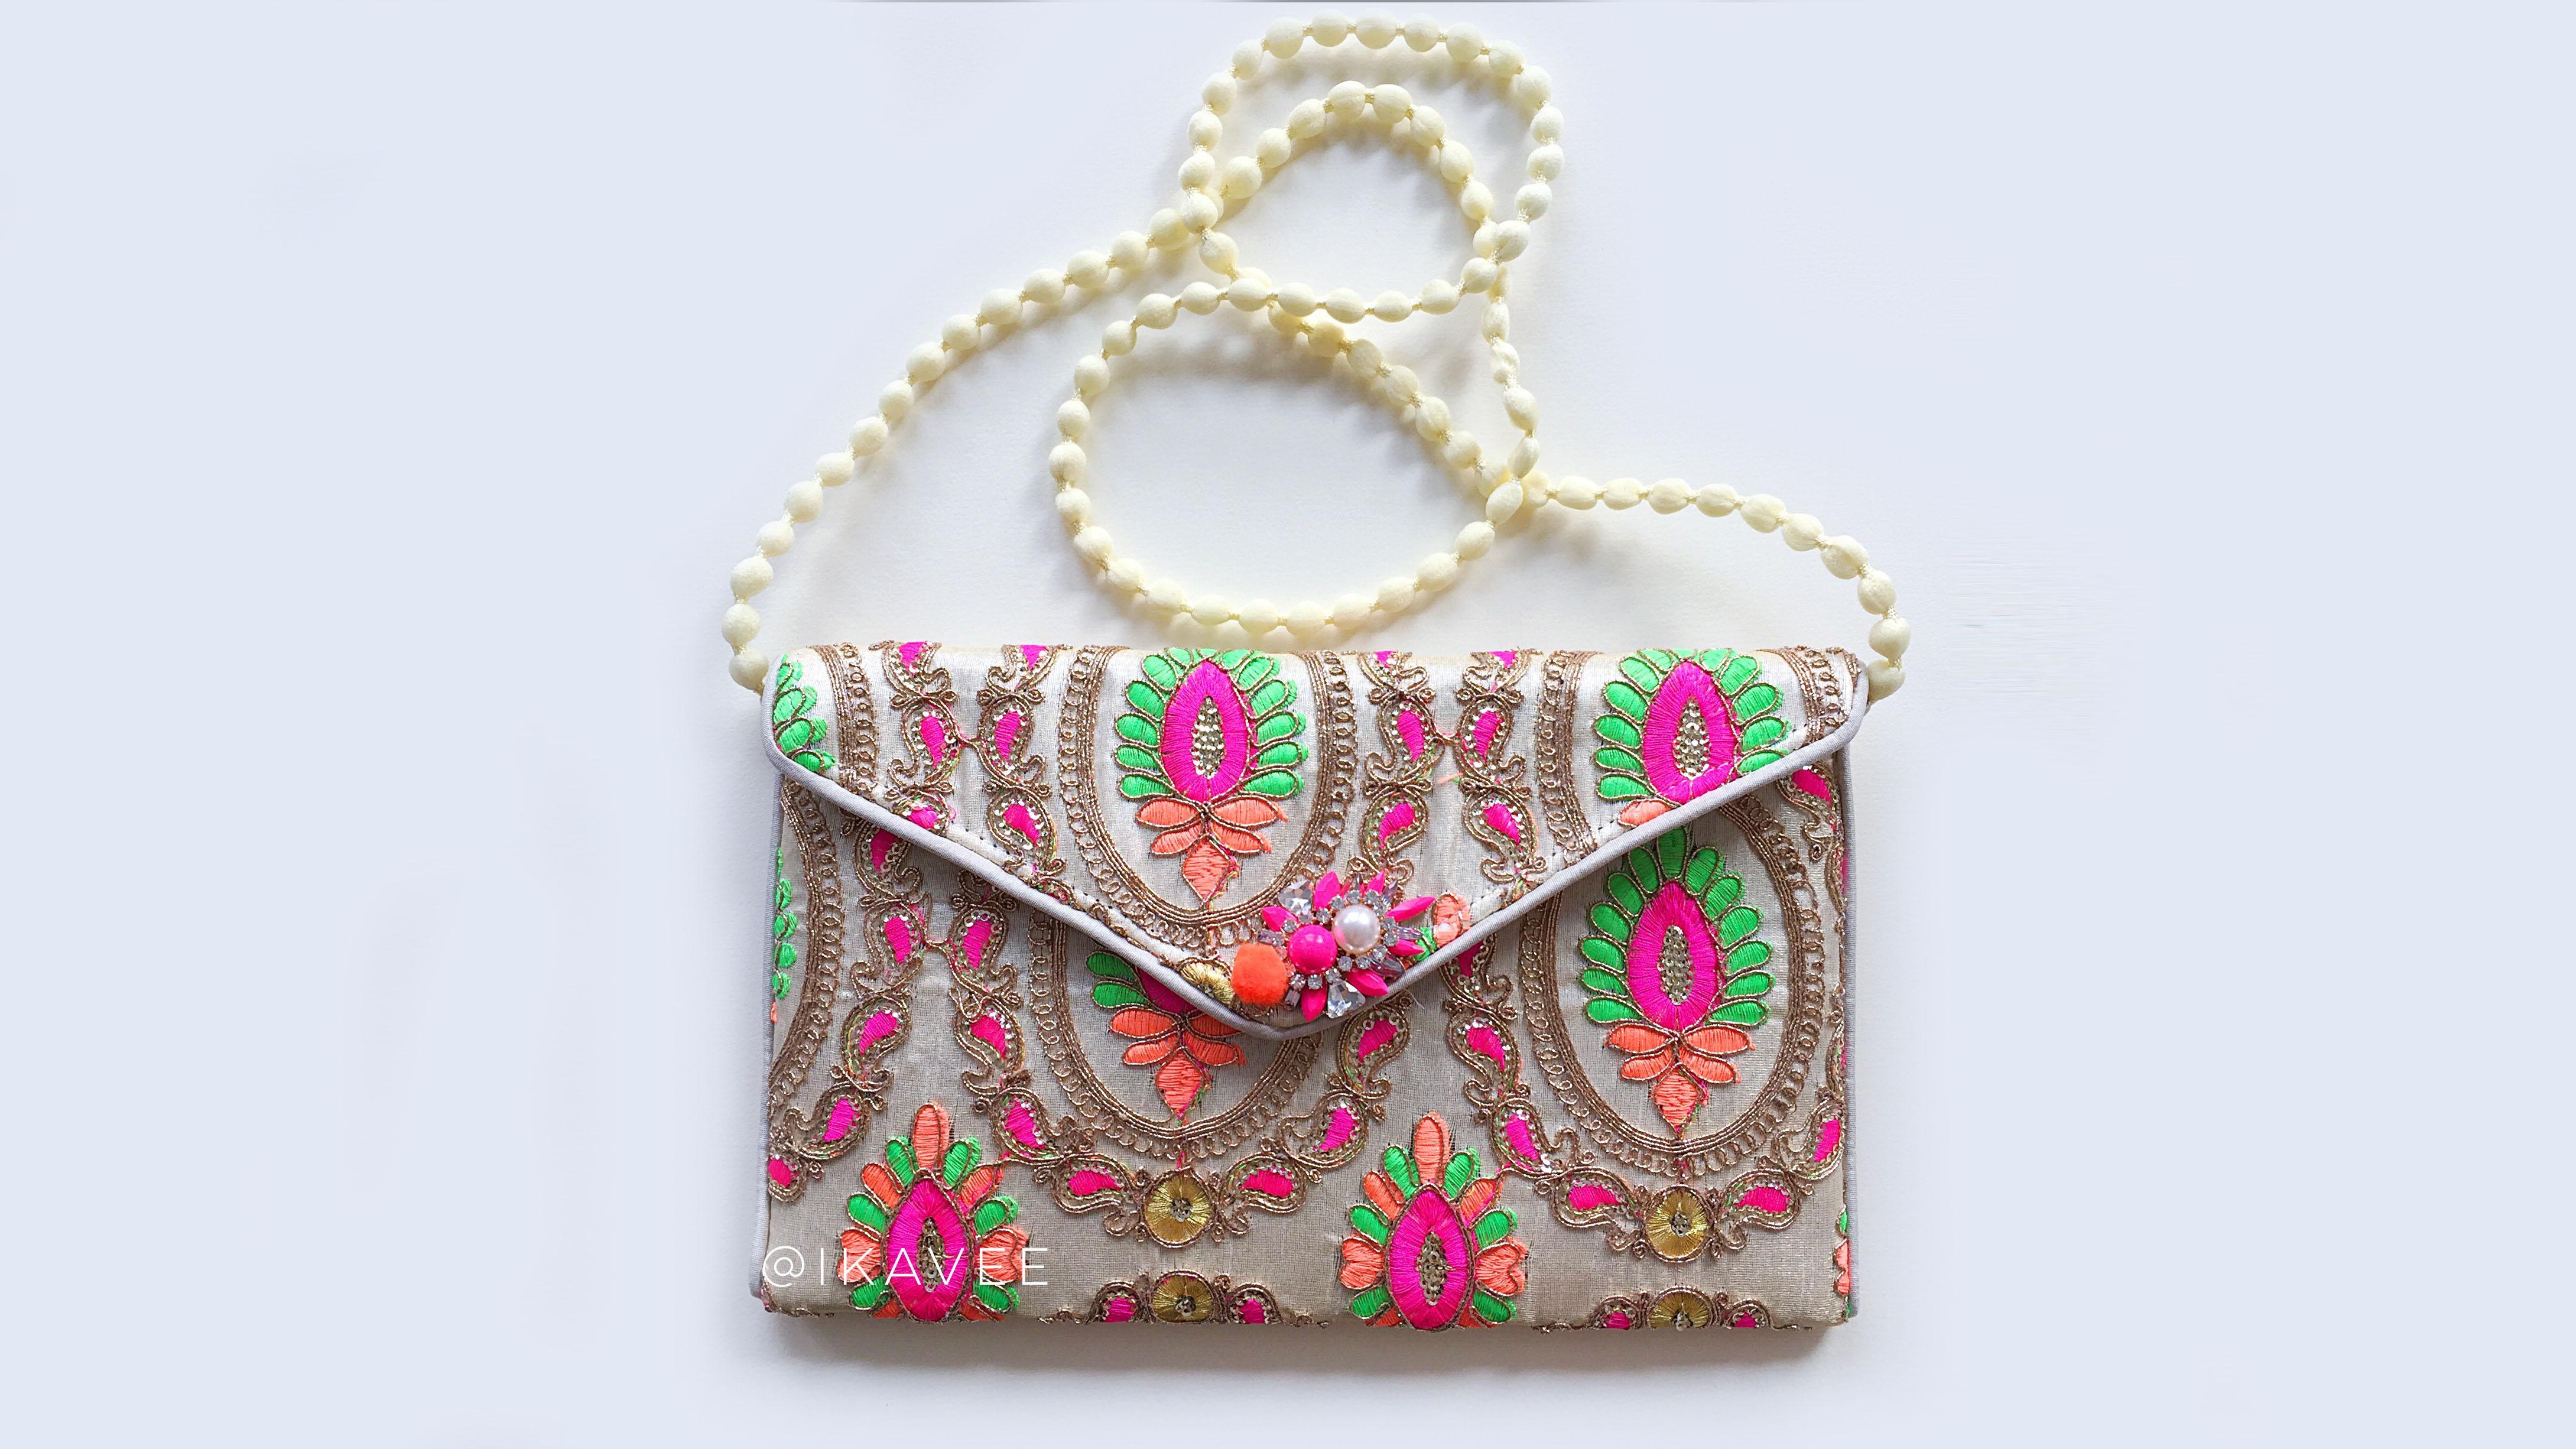 Ikavee bag